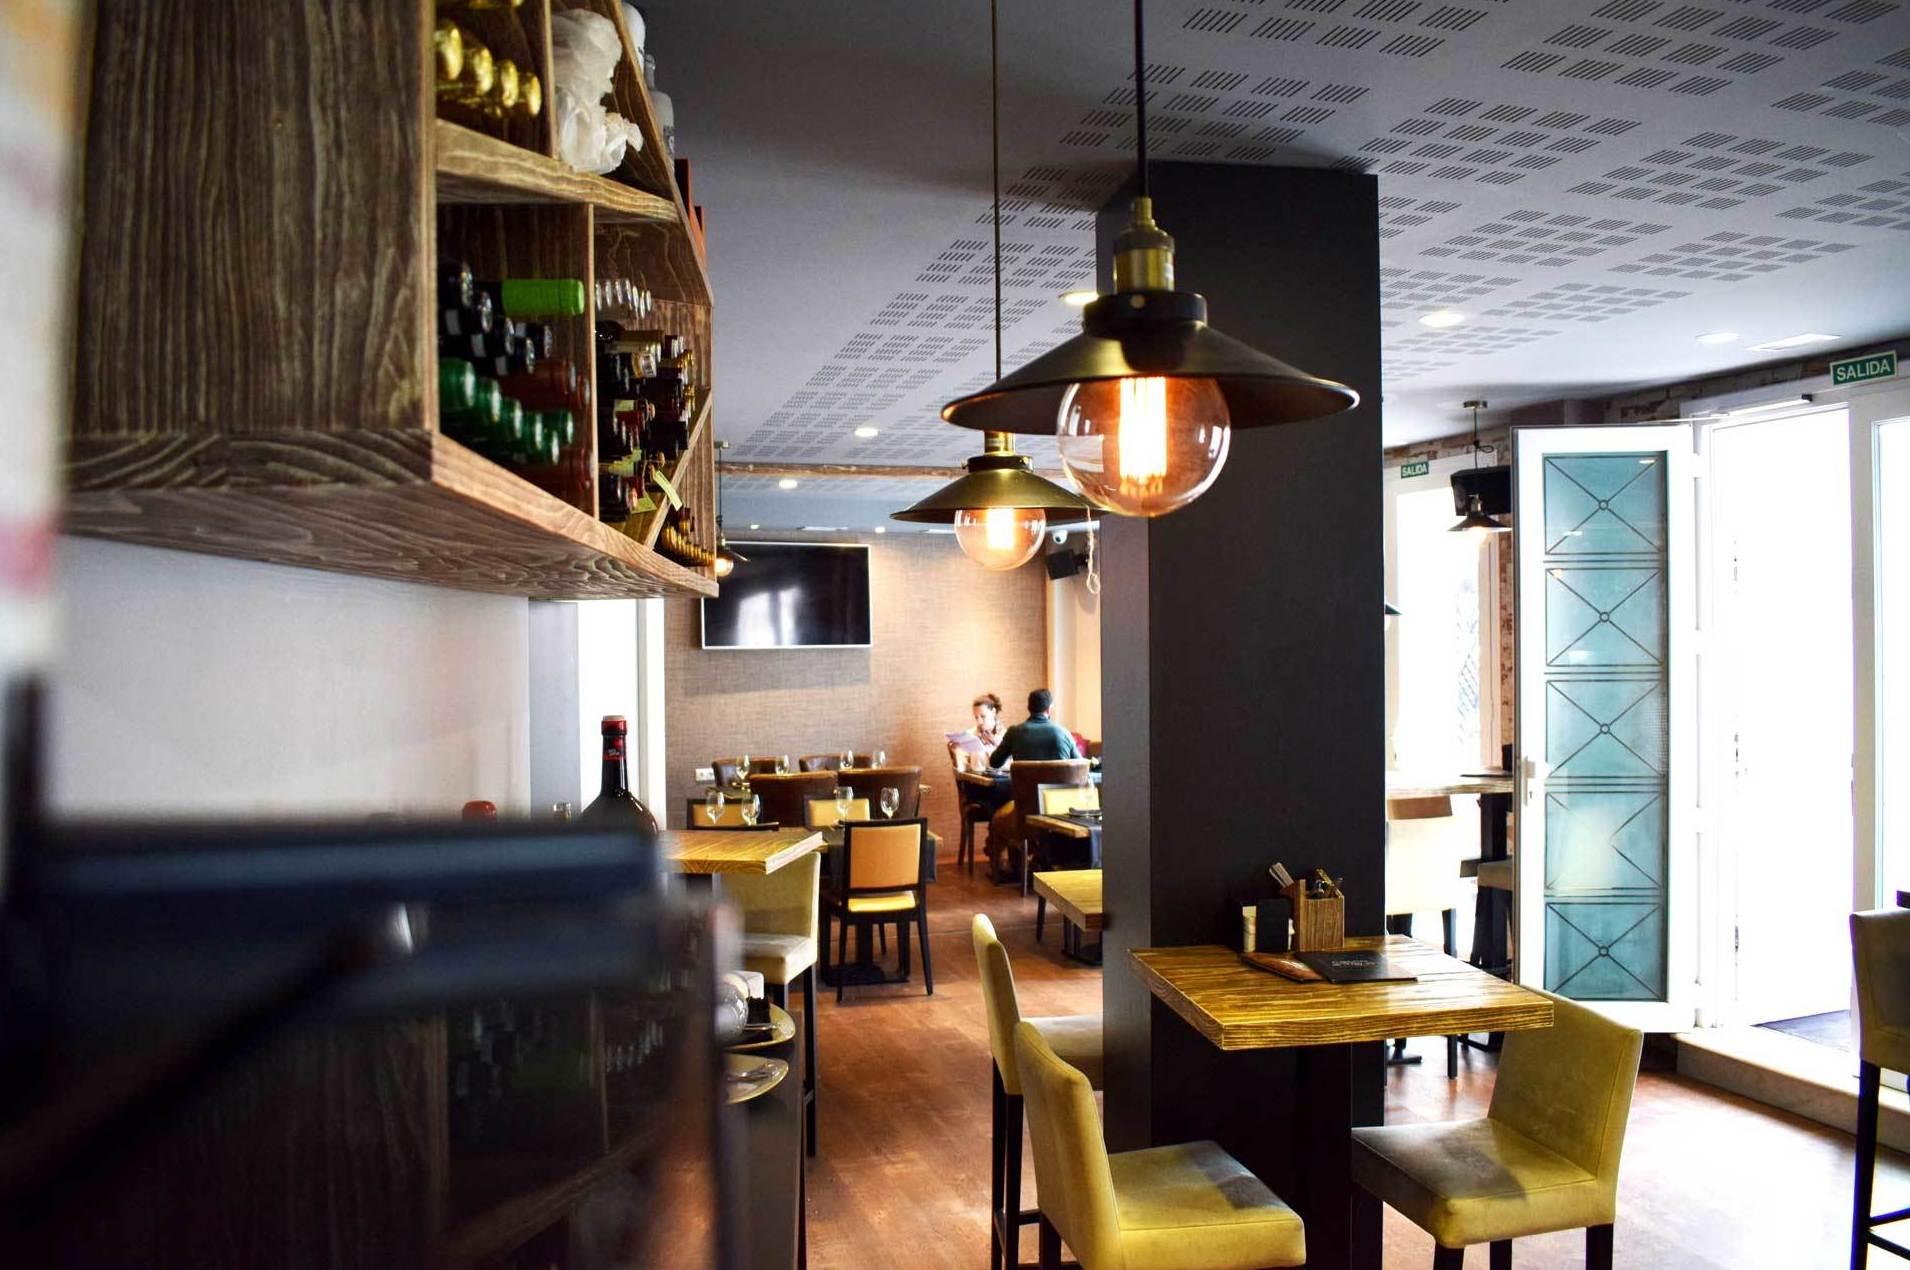 Foto 1 de Cocina mediterránea en Almería | Restaurante Casco Antiguo